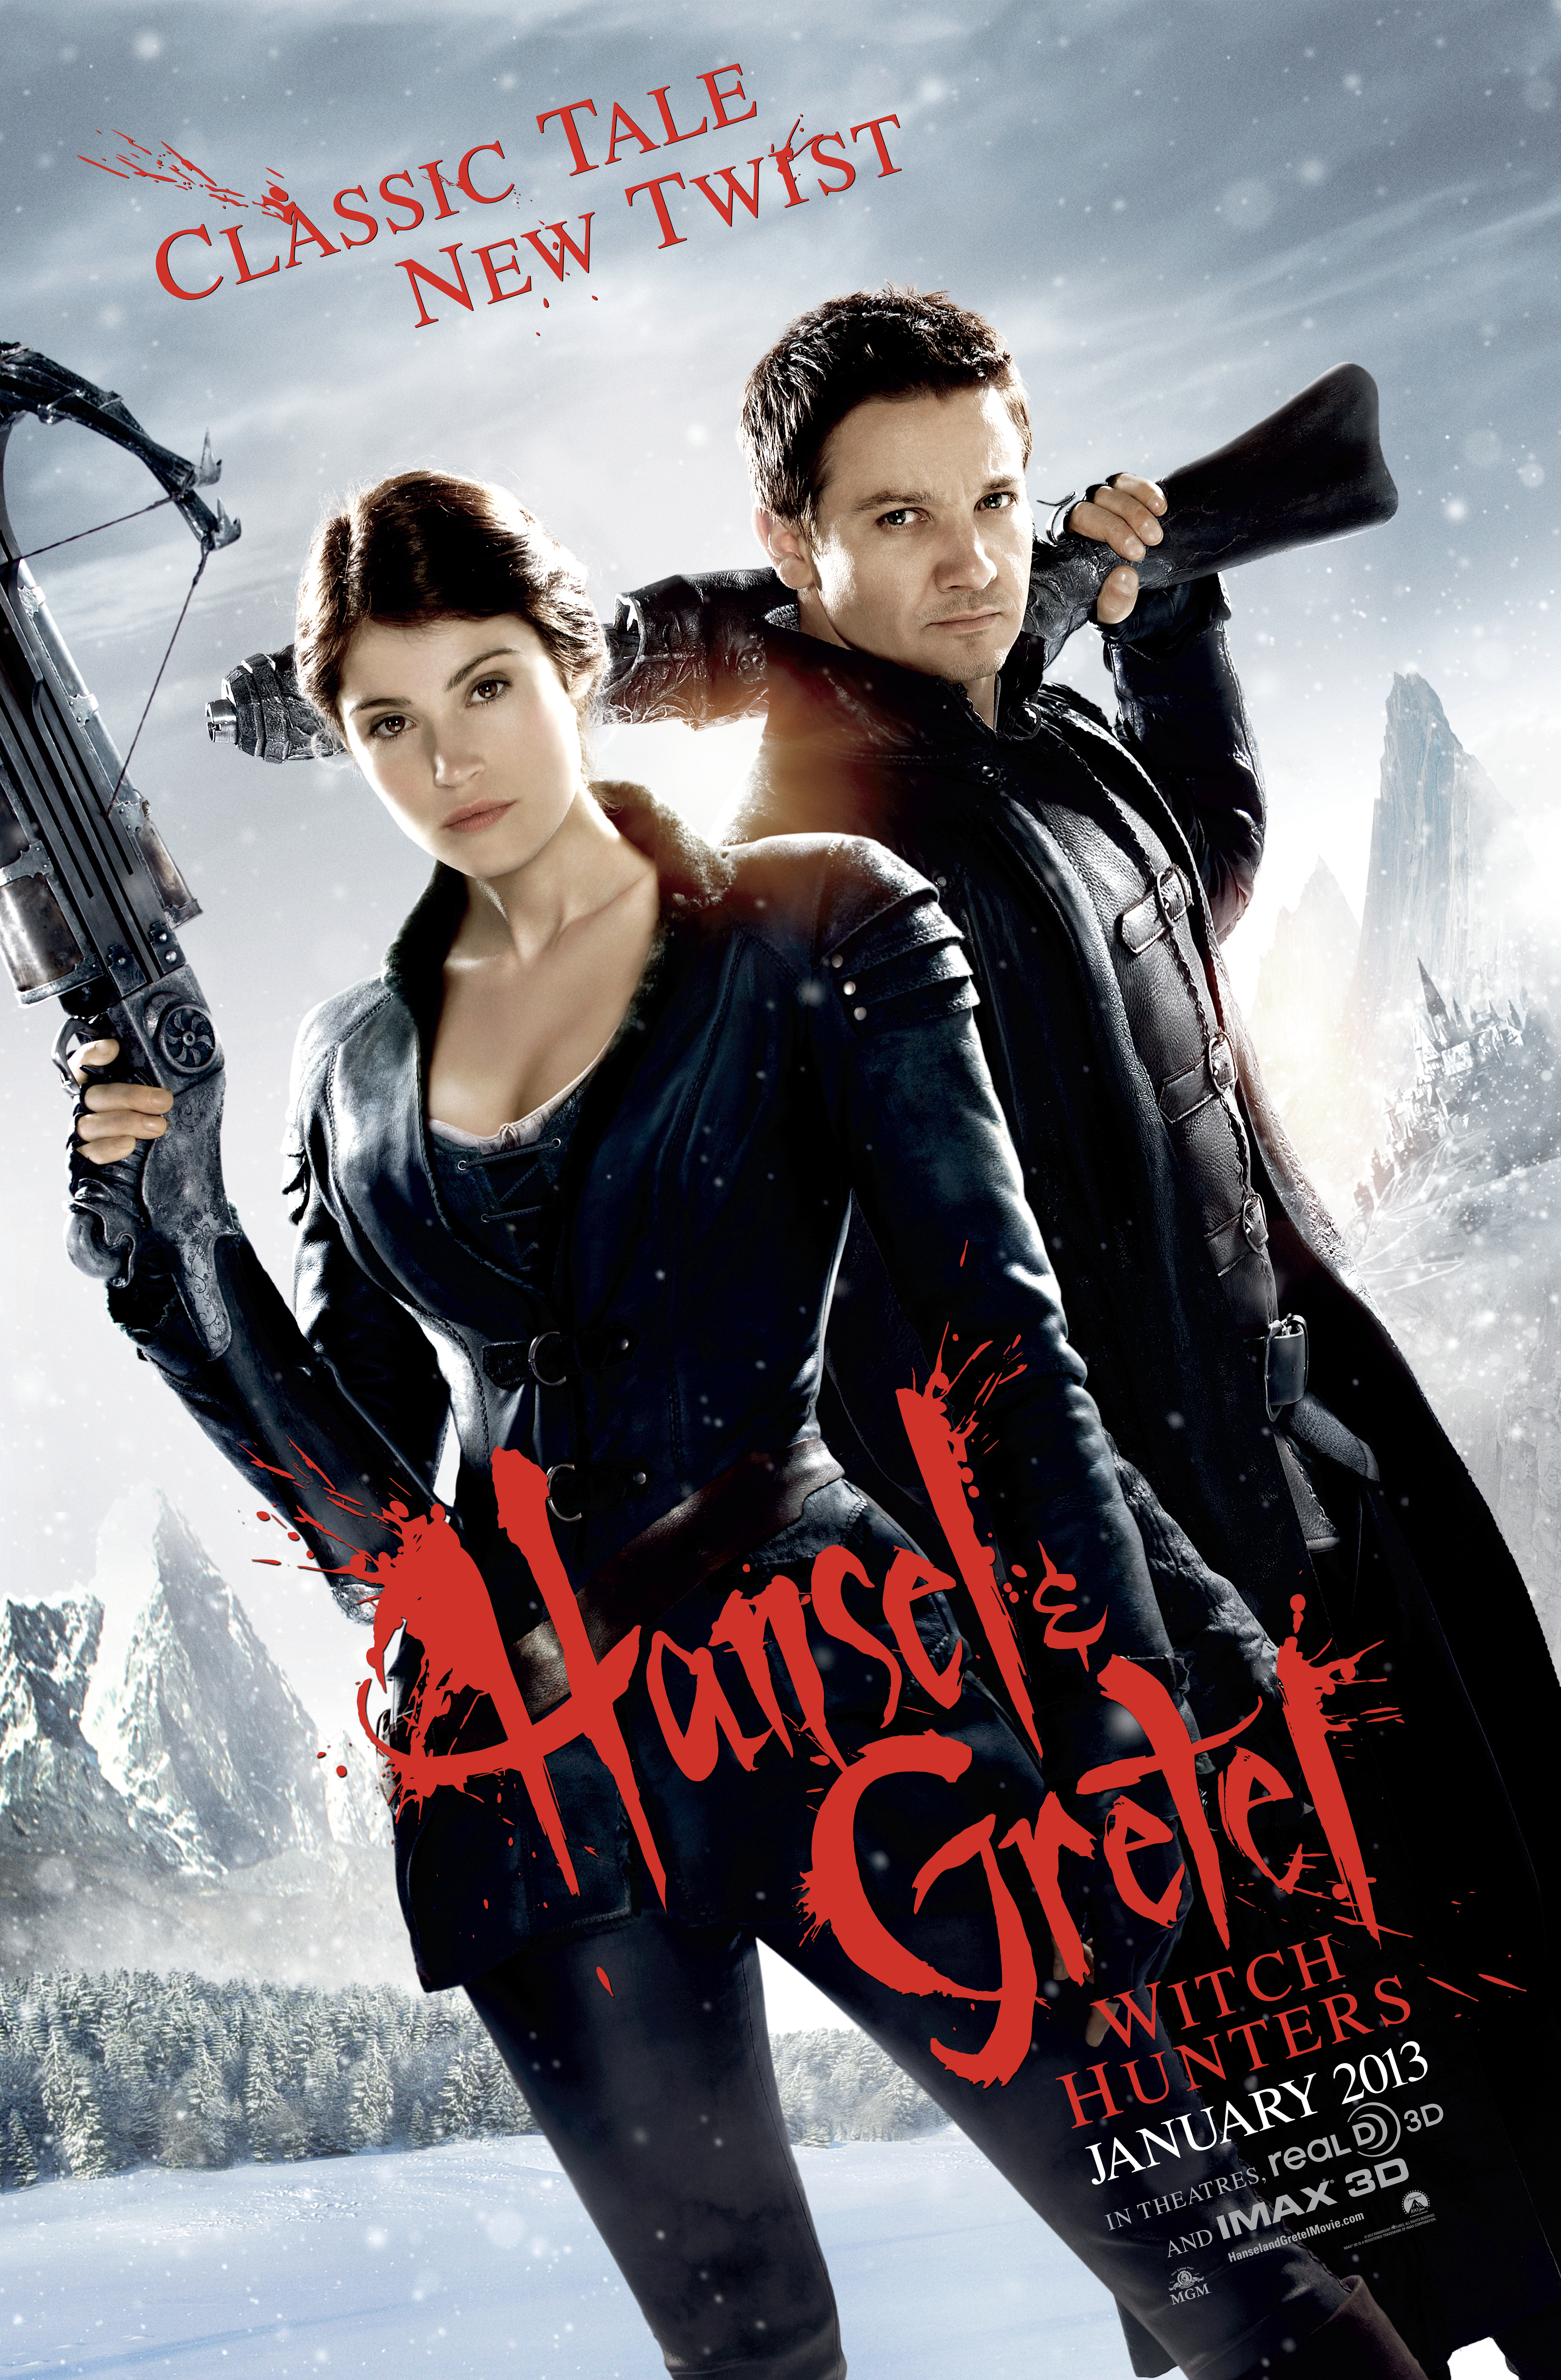 Hansel & Gretel: Witch Hunters - Movie Poster #1 (Original)